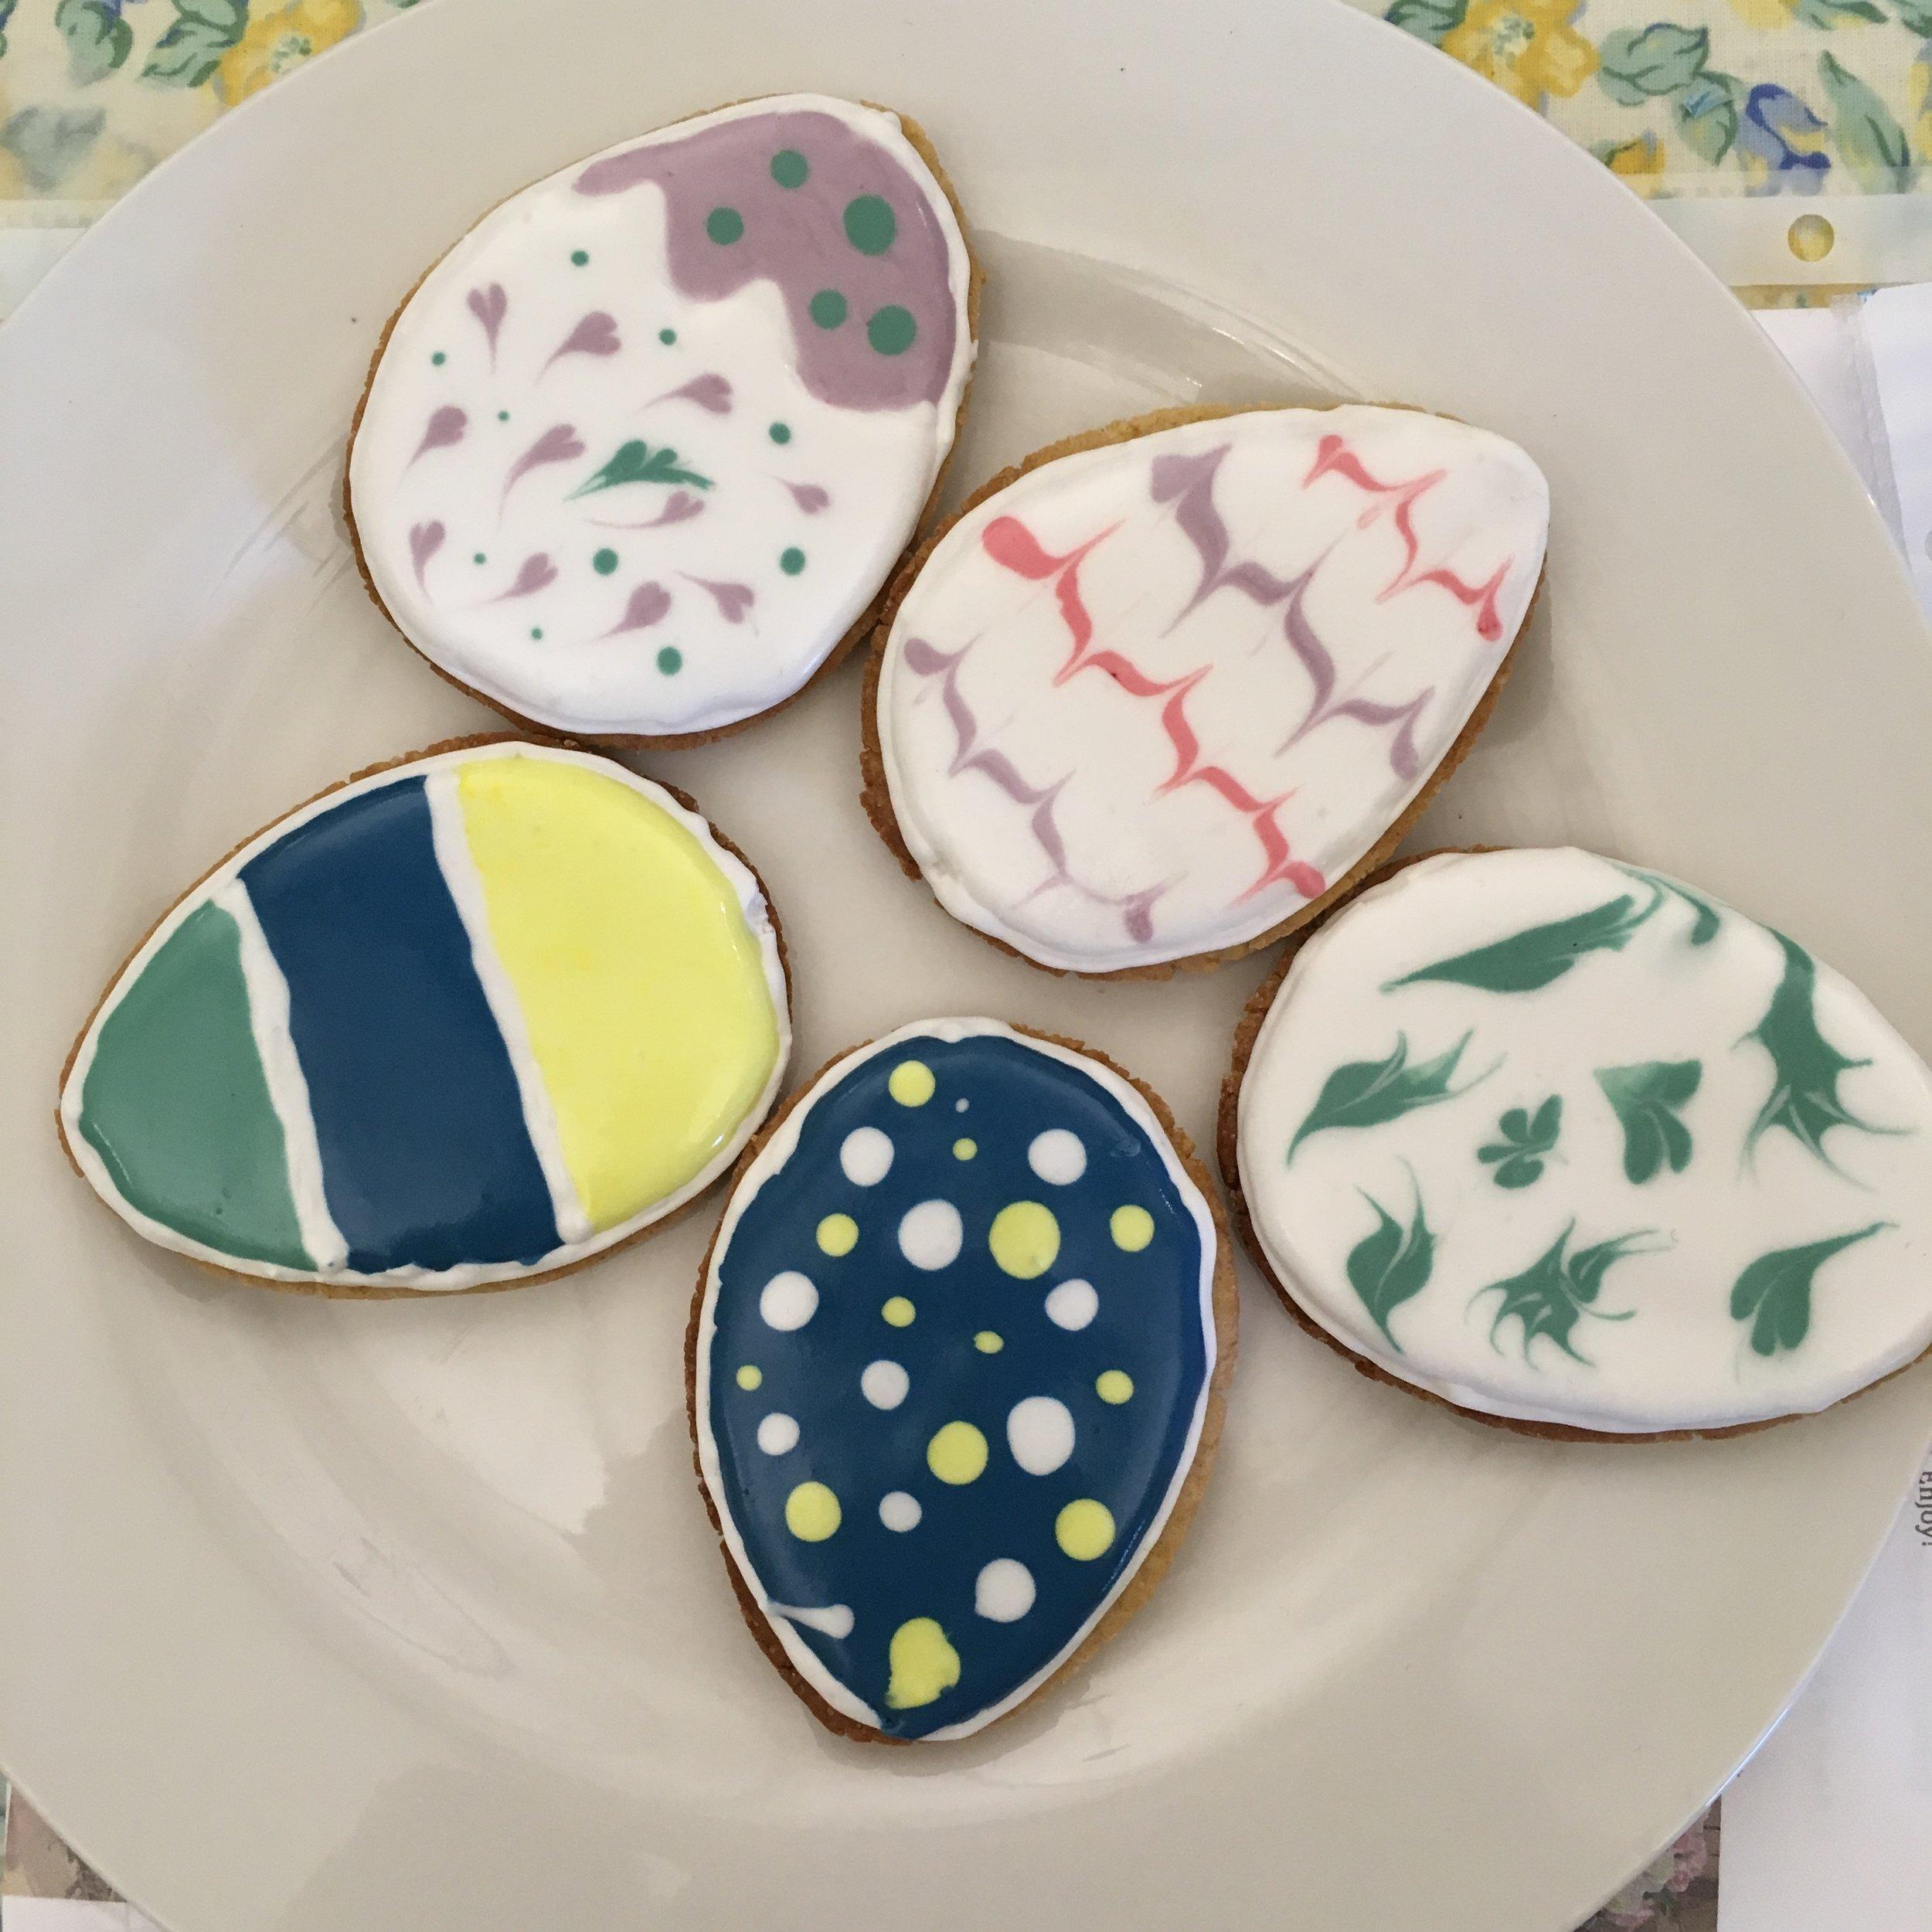 CAP-workshop-iced-biscuits-2